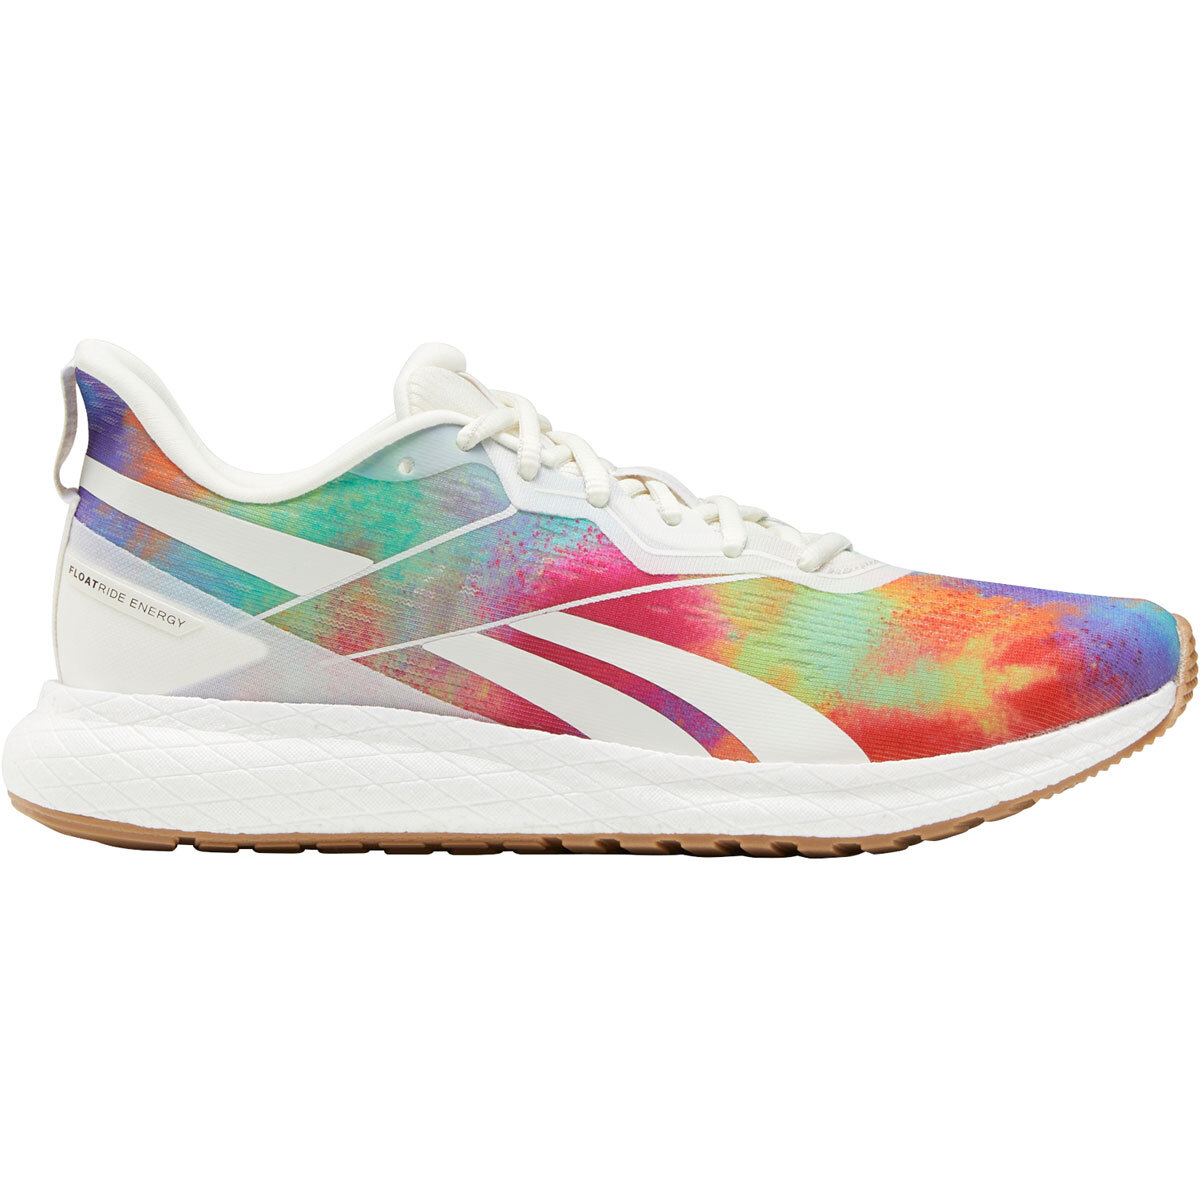 Women's Reebok Forever Floatride Energy 2.0 Running Shoe - Color: Pride - Size: 5 - Width: Regular, Pride, large, image 1